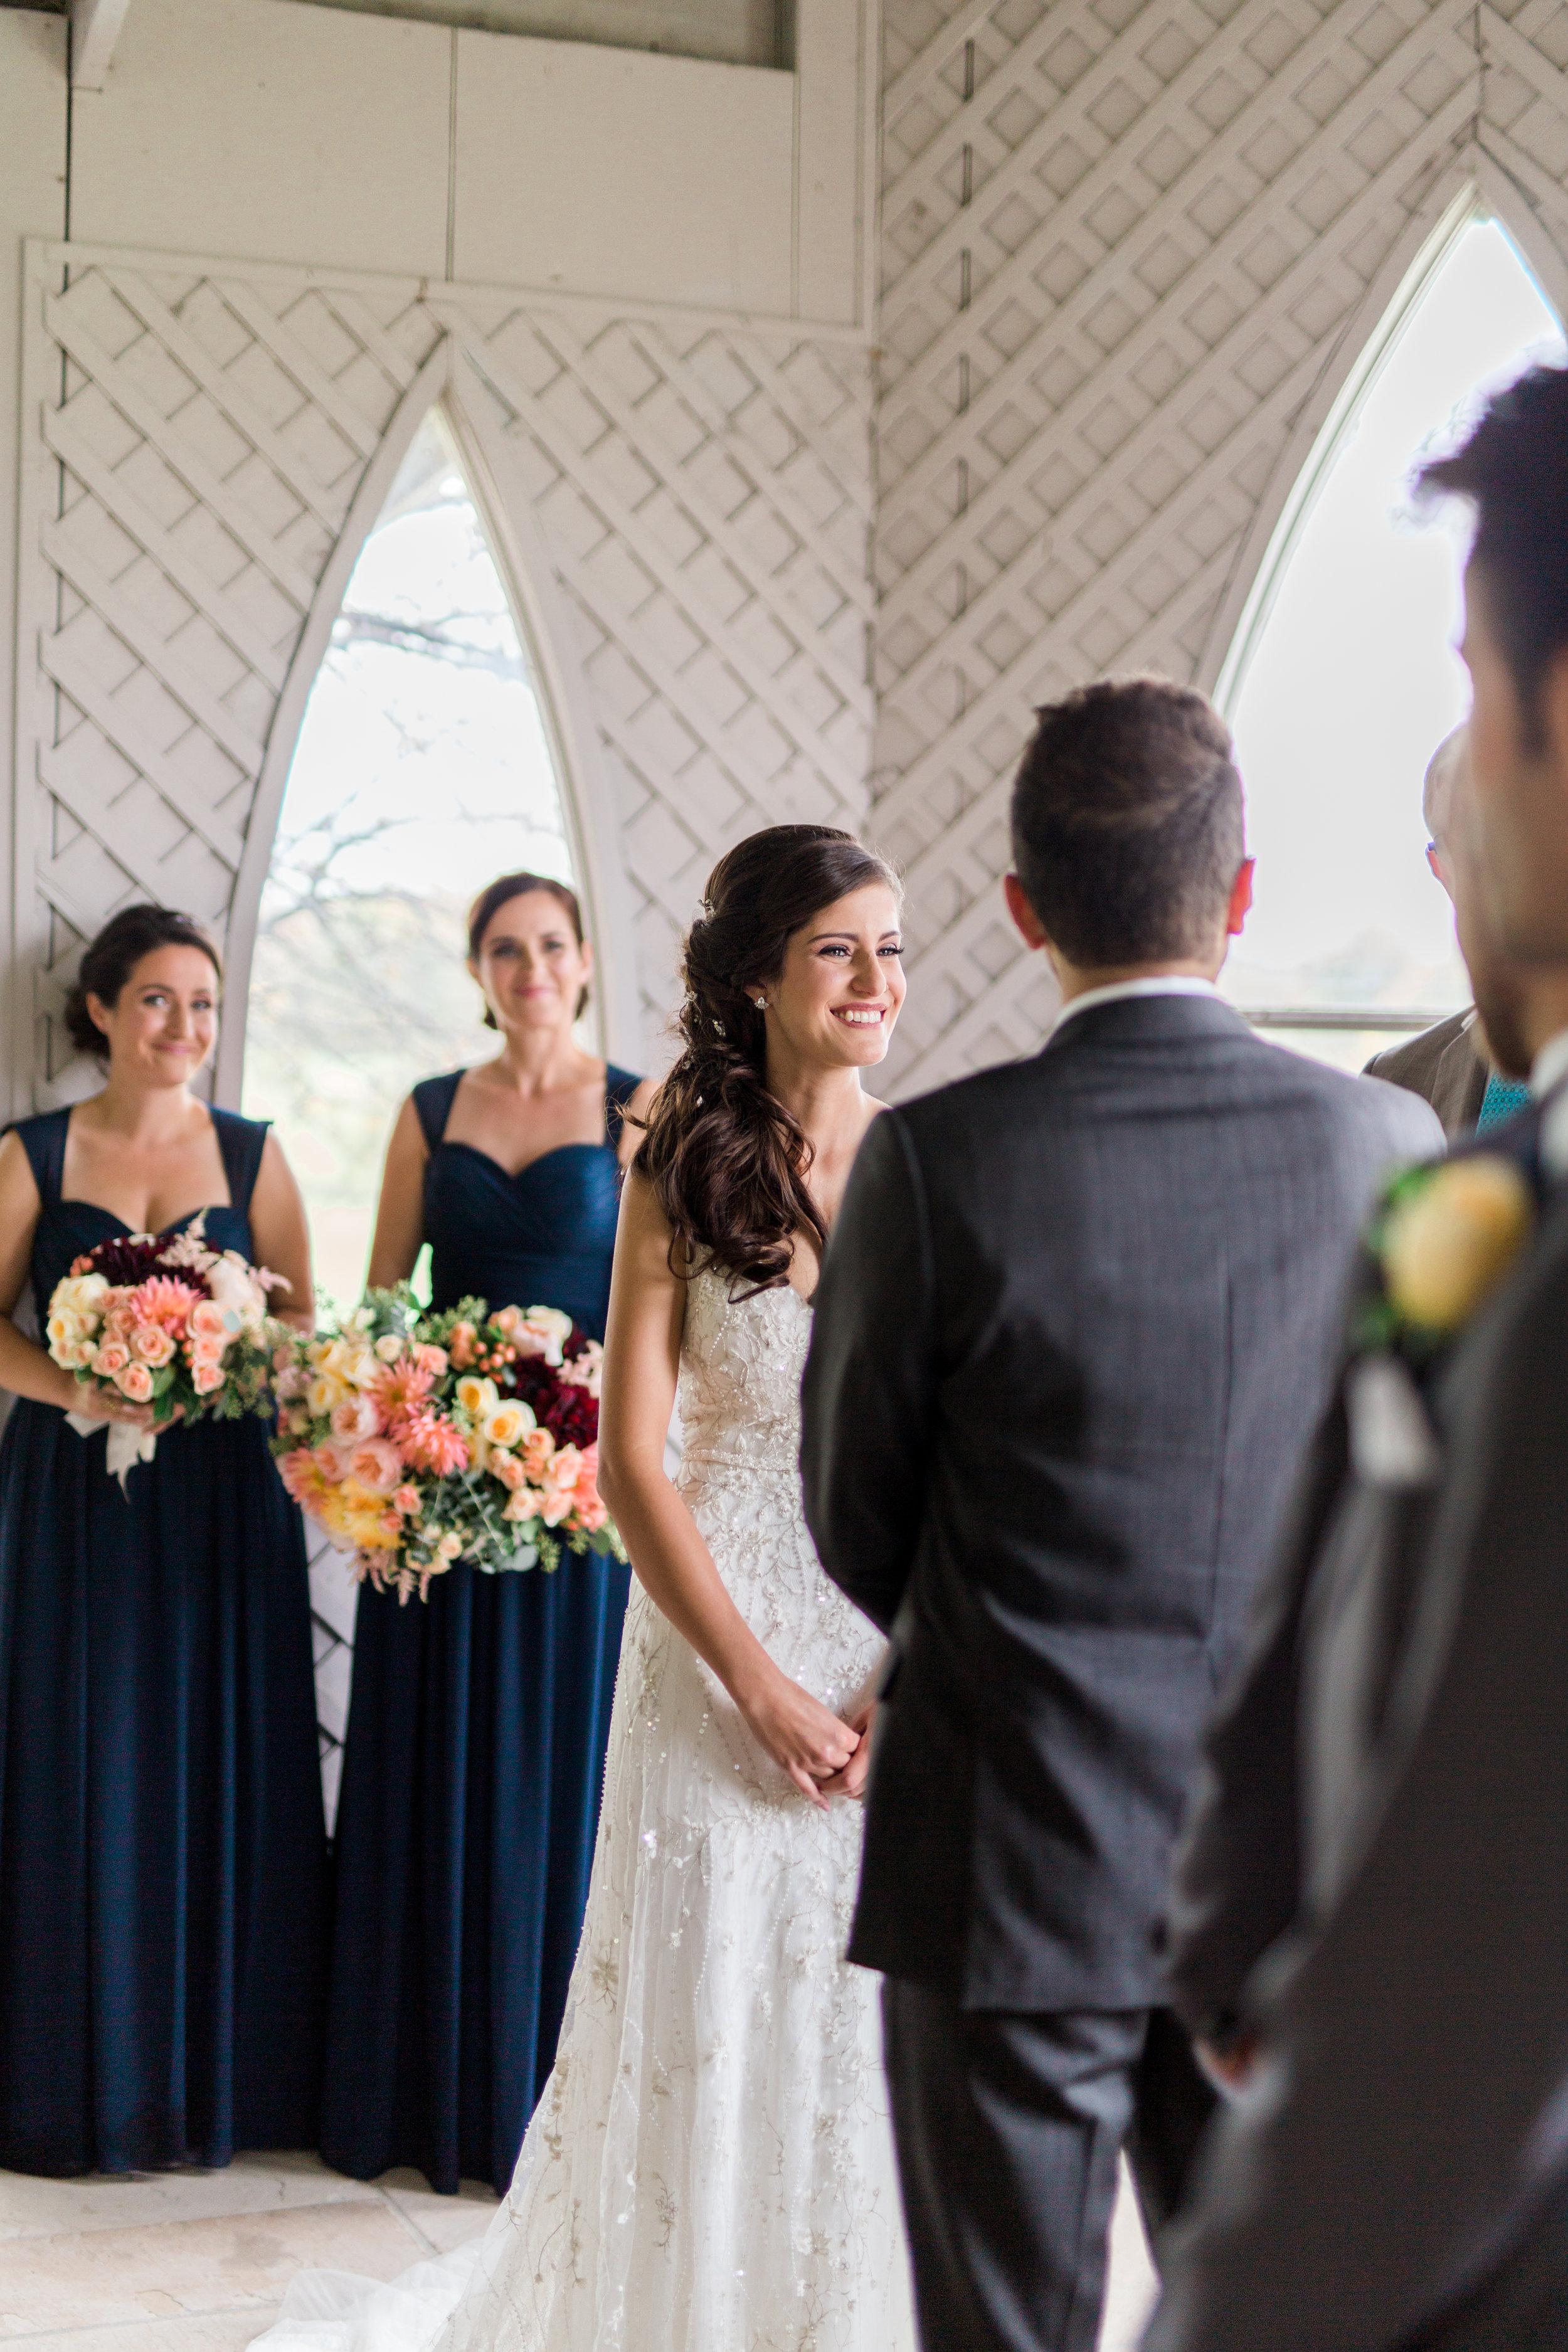 Amir-Golbazi-Danielle-Giroux-Photography_Toronto-Wedding_Cedarwood_Rachel-Paul_184.jpg